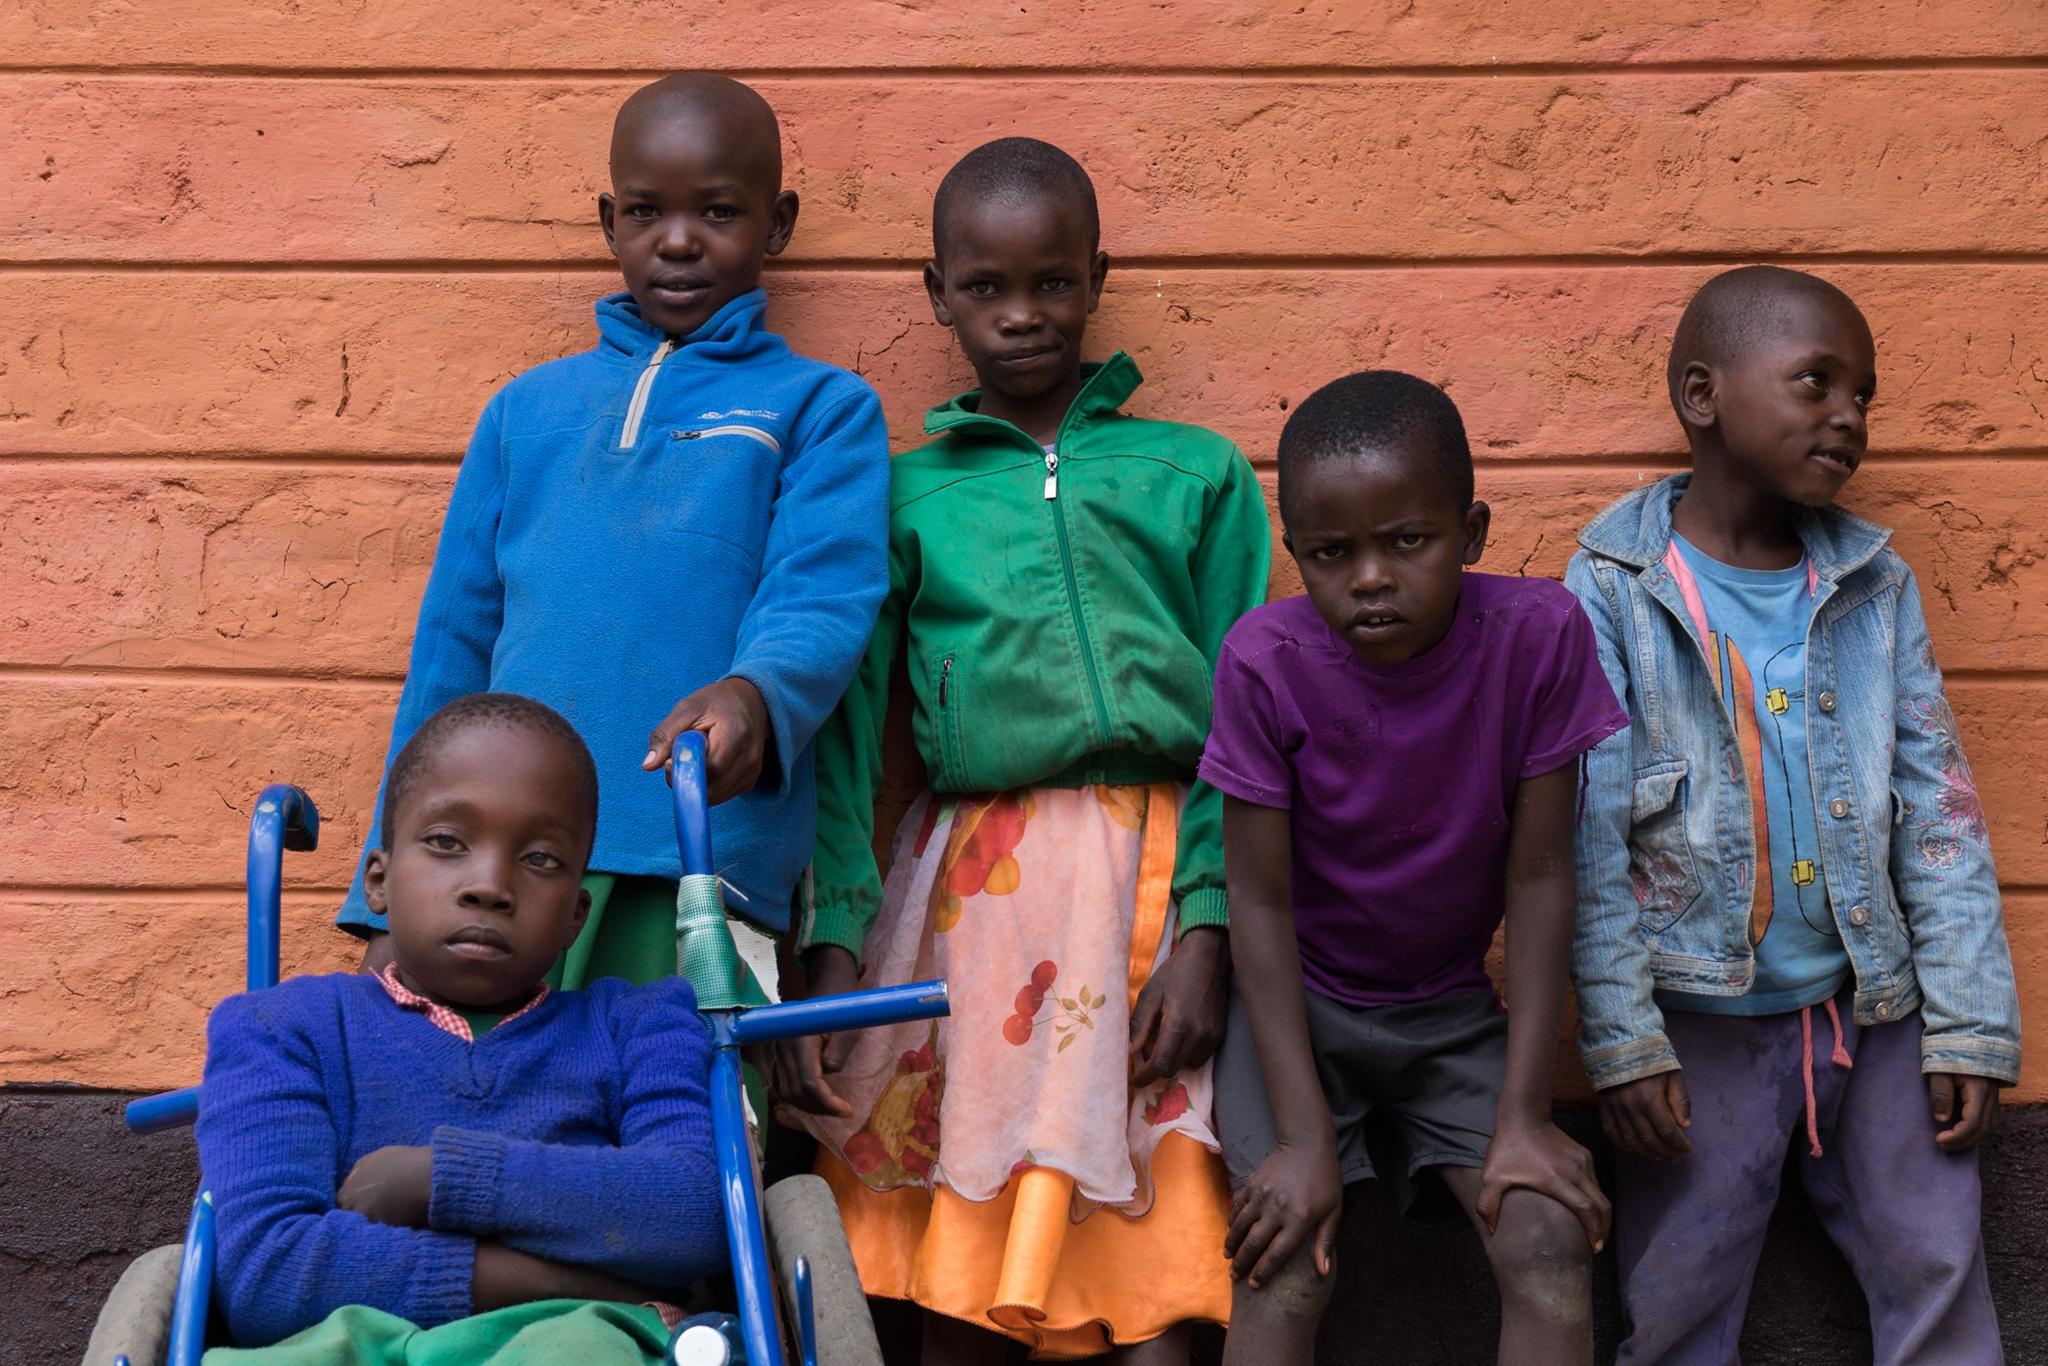 kenya_schoolchildren_portrait